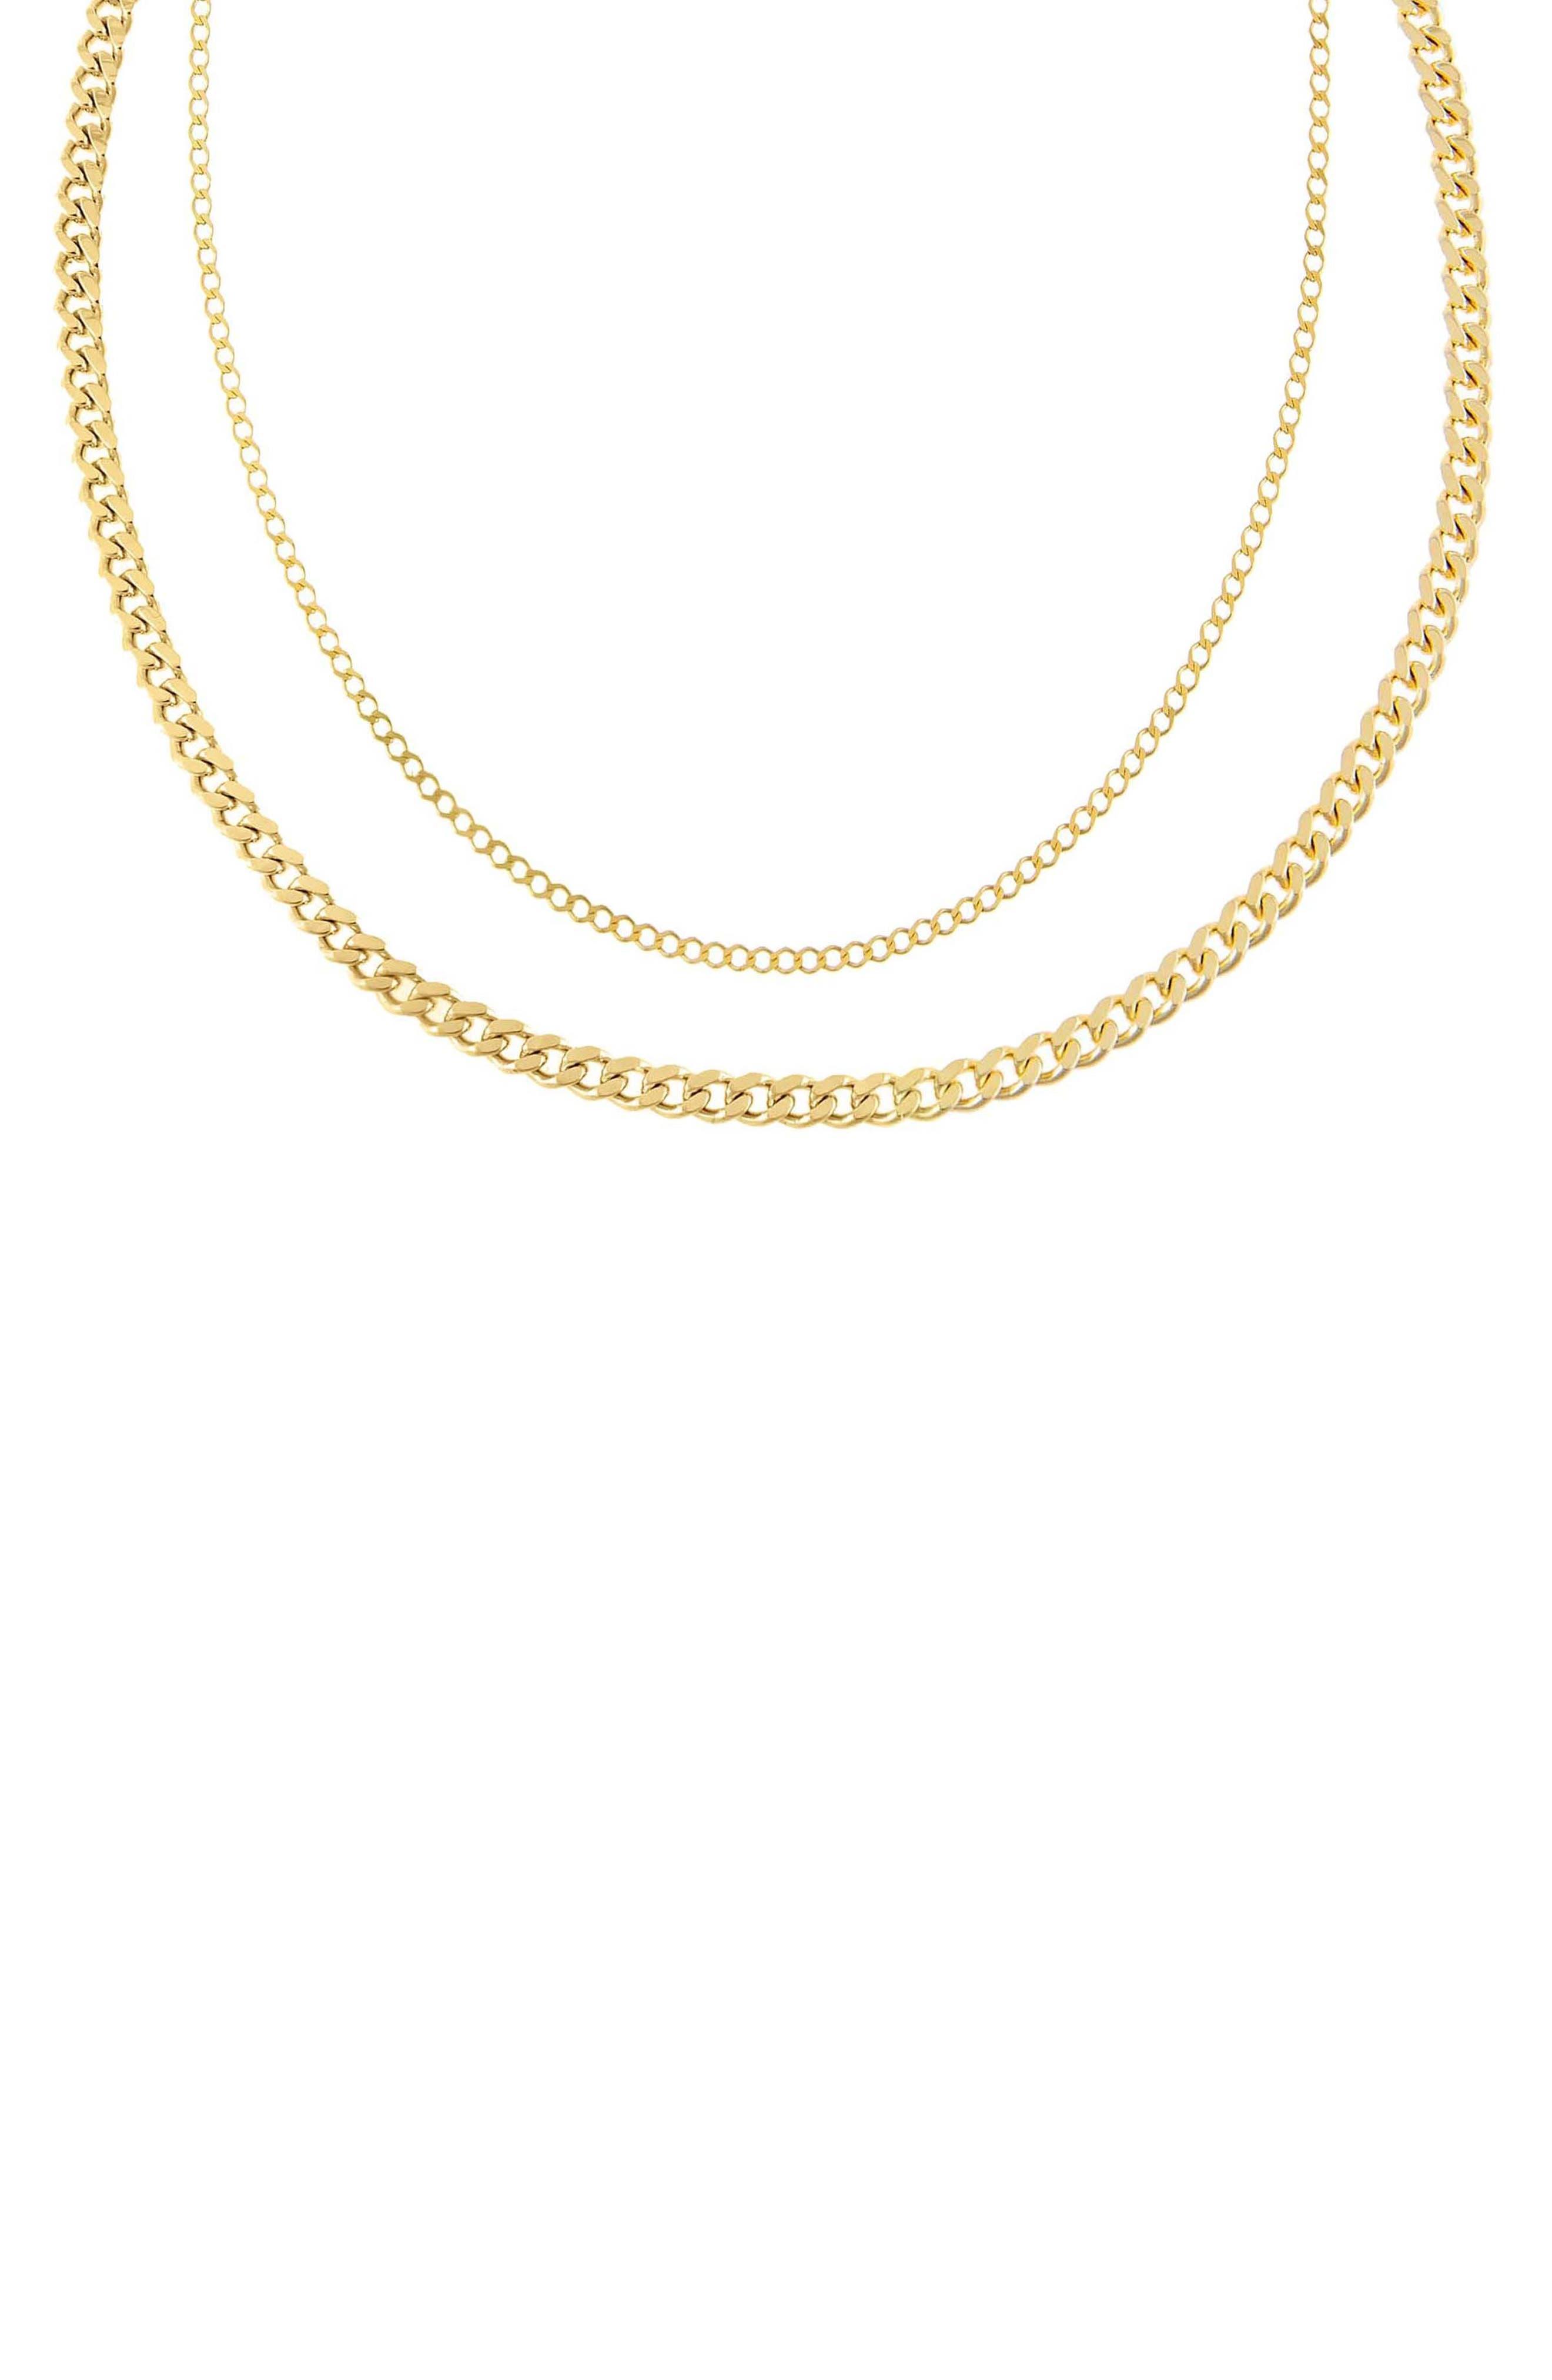 Women's Adina's Jewels Layered Cuban Chain Necklace